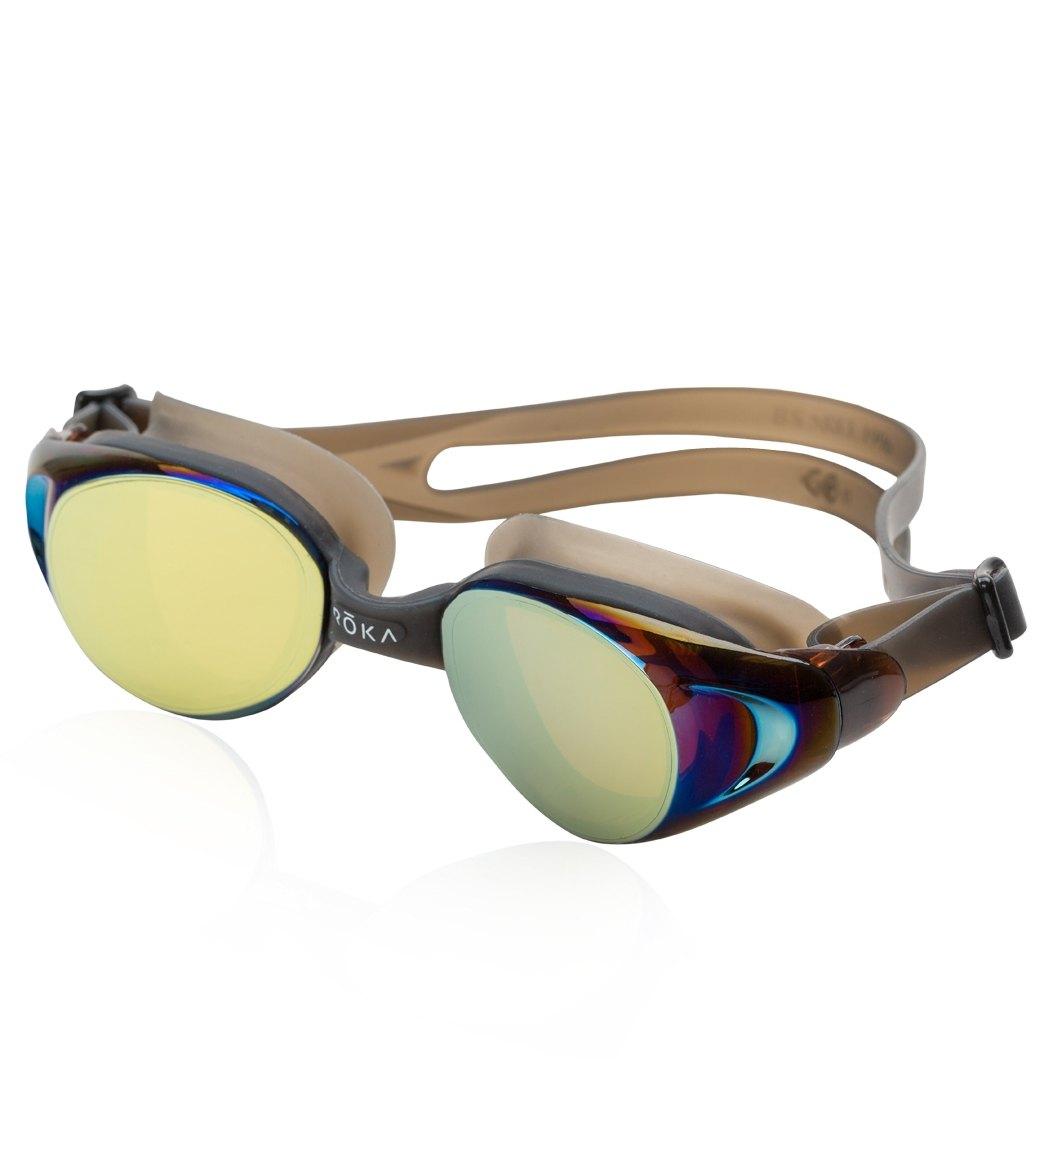 1c323f69206 ROKA Sports X1 Oversize Mirror Goggles at SwimOutlet.com